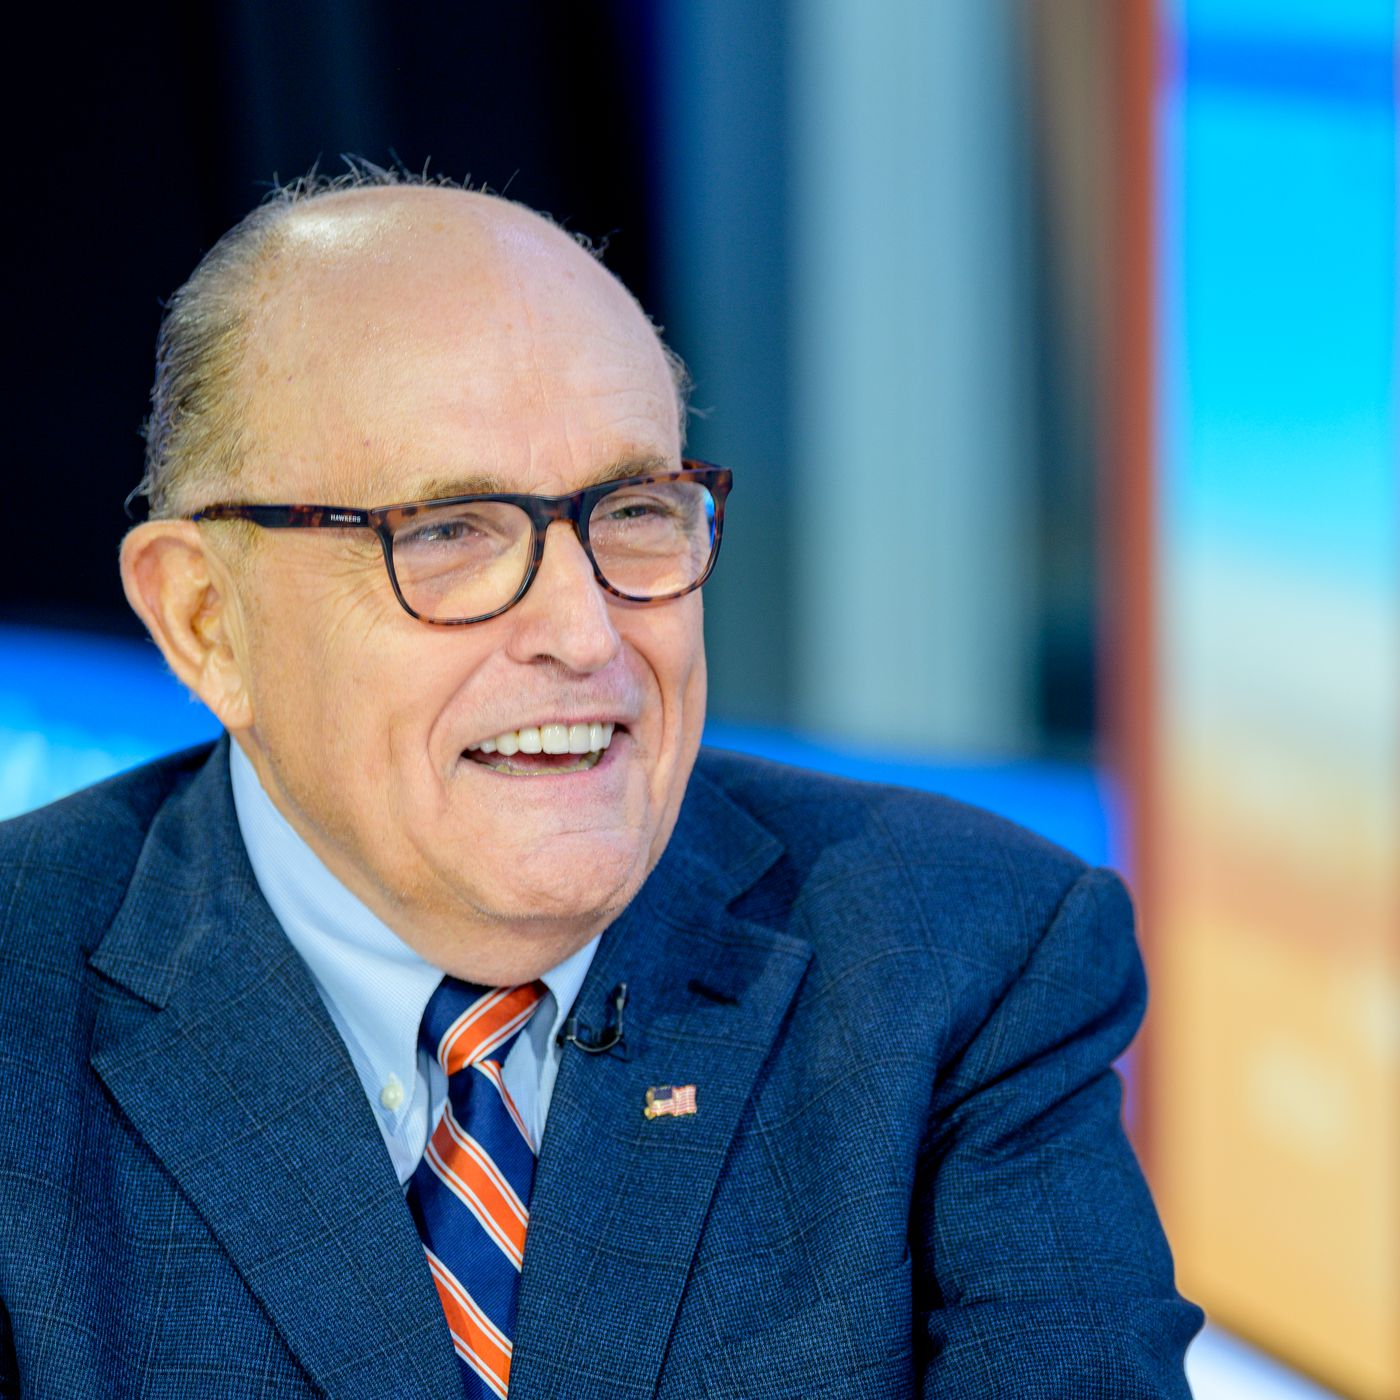 rudy giuliani Rudy Giuliani's path from New York mayor to Trump and Ukraine   Vox